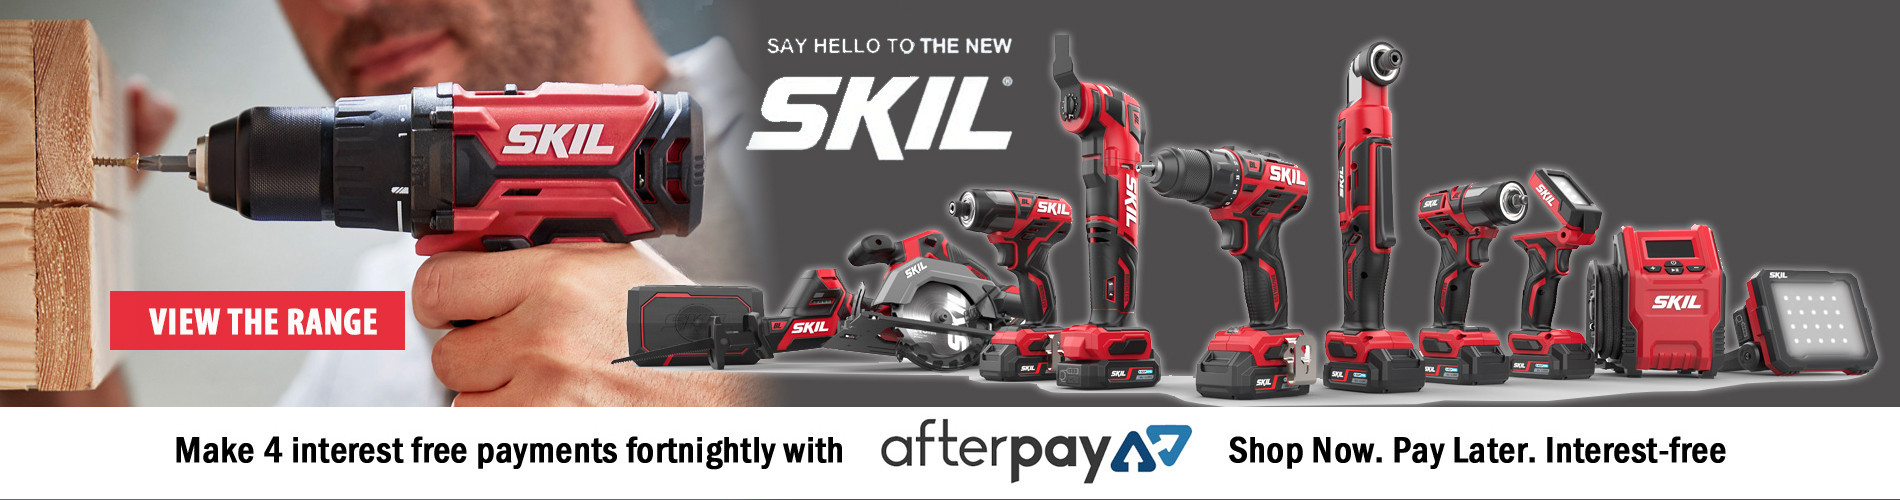 Skil Power Tools Audel Tools Dandenong